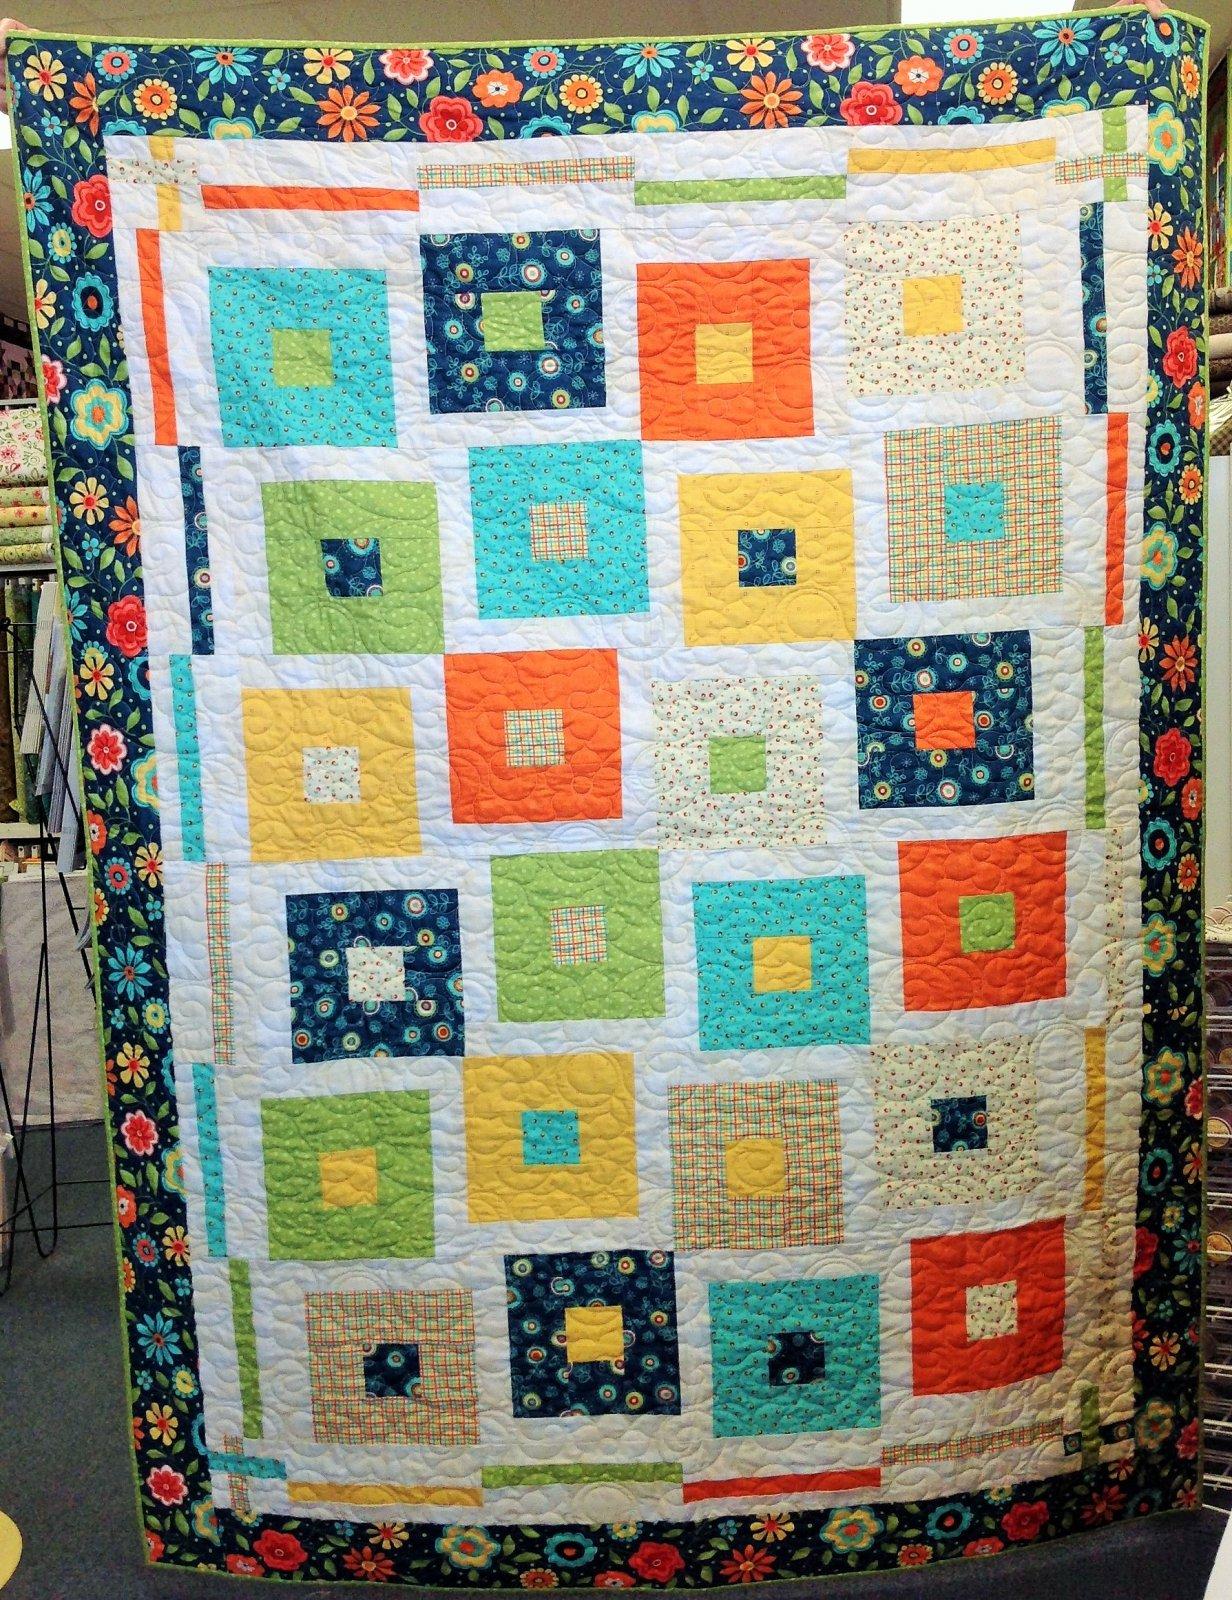 Playa Del Sol by Nancy Rink, Fabric Kit